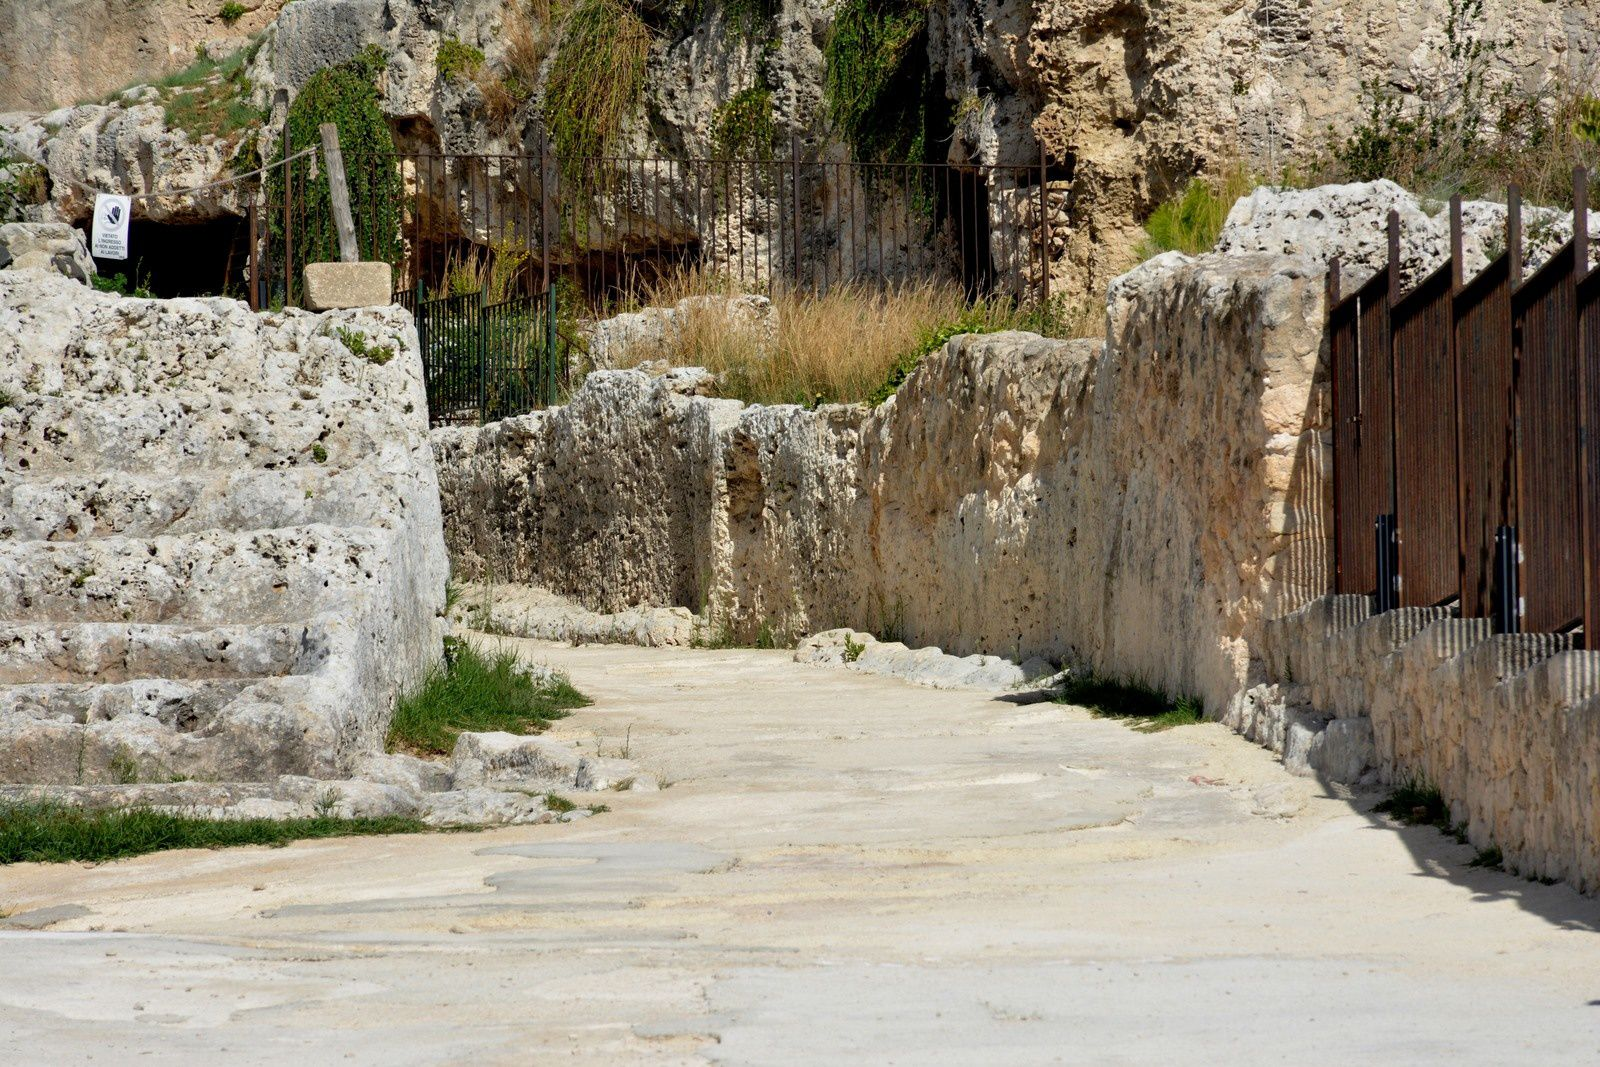 Sicilia settembre 2015 : Siracusa &quot&#x3B;Neapolis&quot&#x3B;.